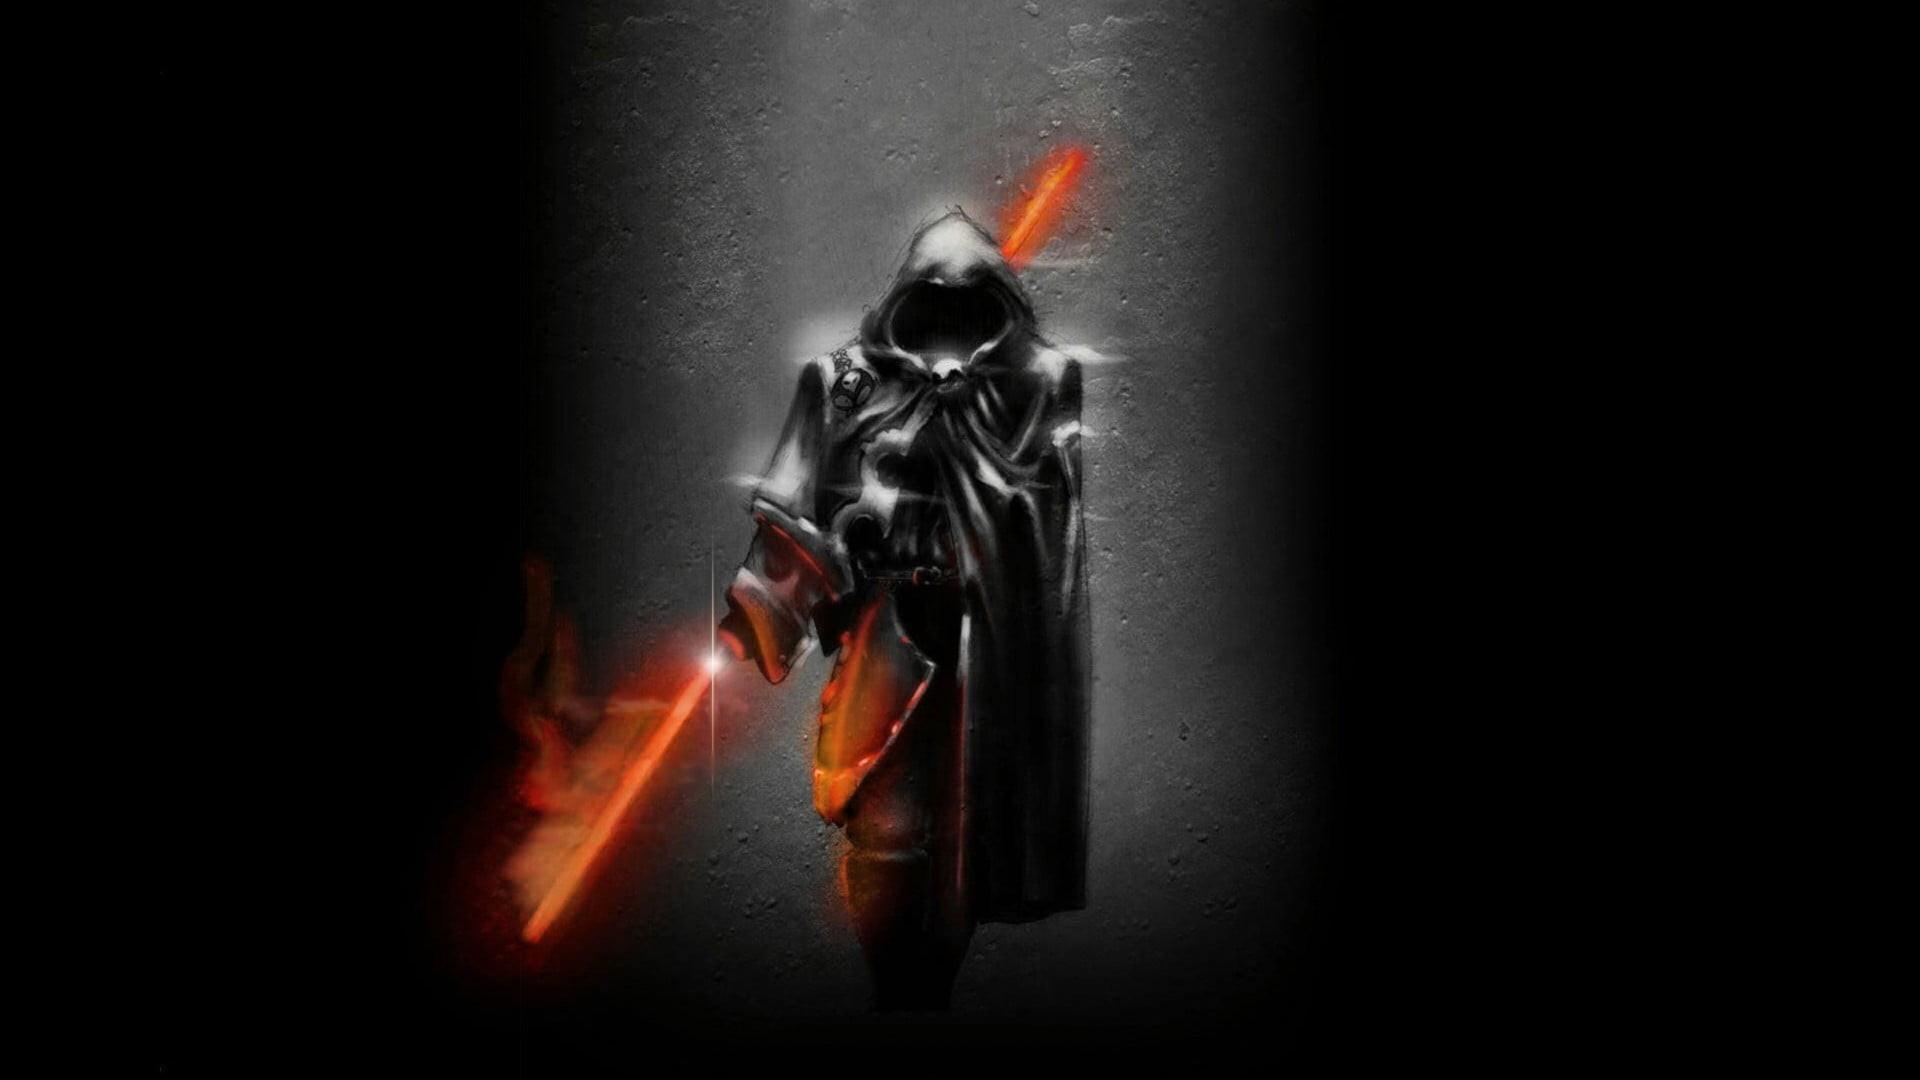 1920x1080 Star Wars Darth Maul With Red Red Lightsaber Sith Assassin Fanart 1920x1080 Wallpaper Teahub Io